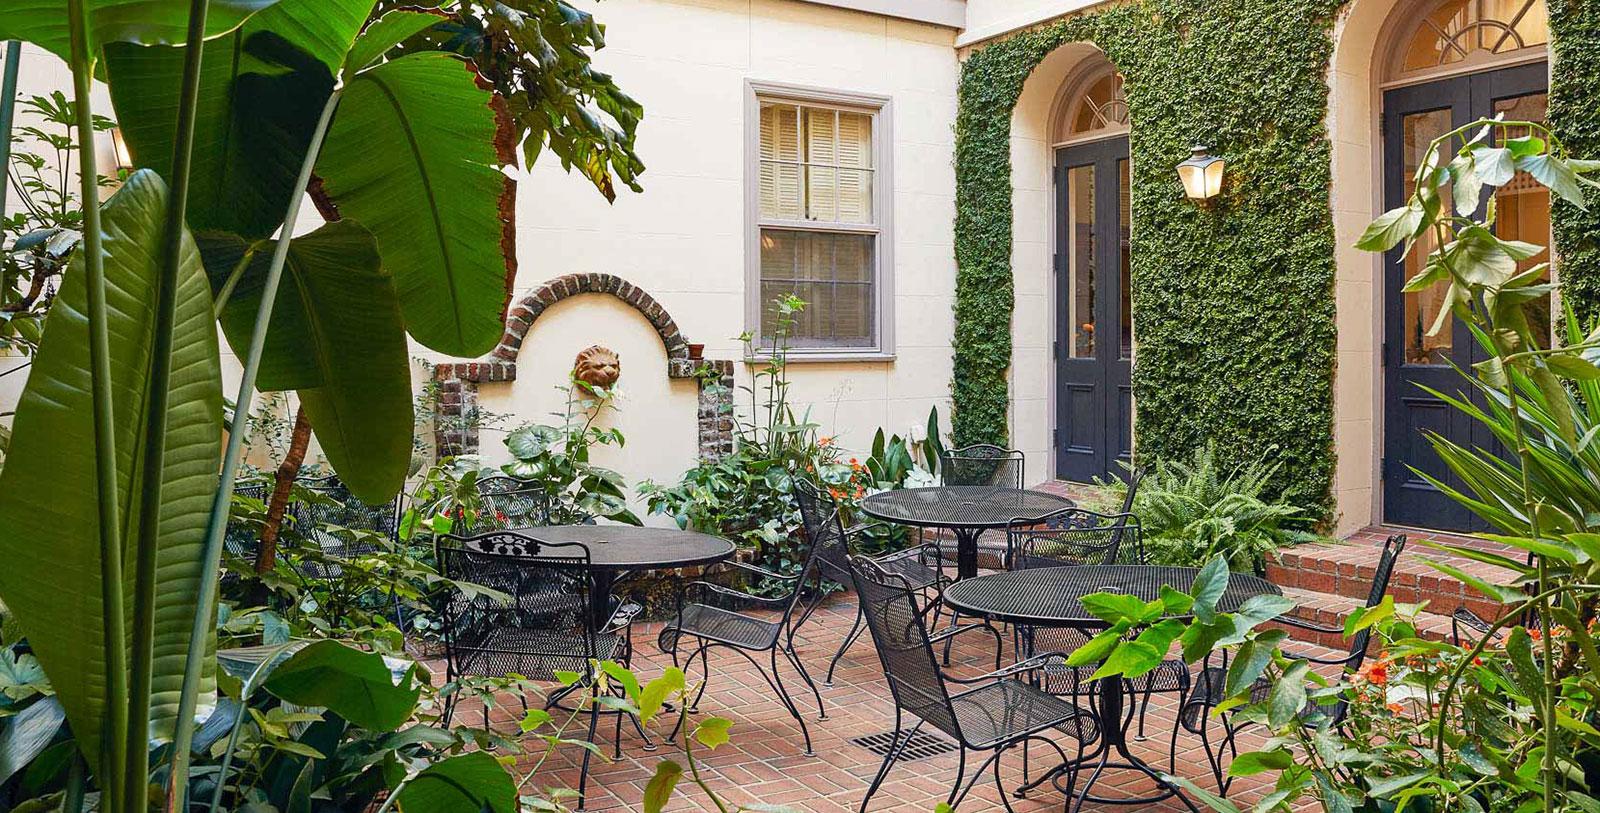 Image of Courtyard, Kings Courtyard Inn in Charleston, South Carolina, 1853, Member of Historic Hotels of America, Hot Deals